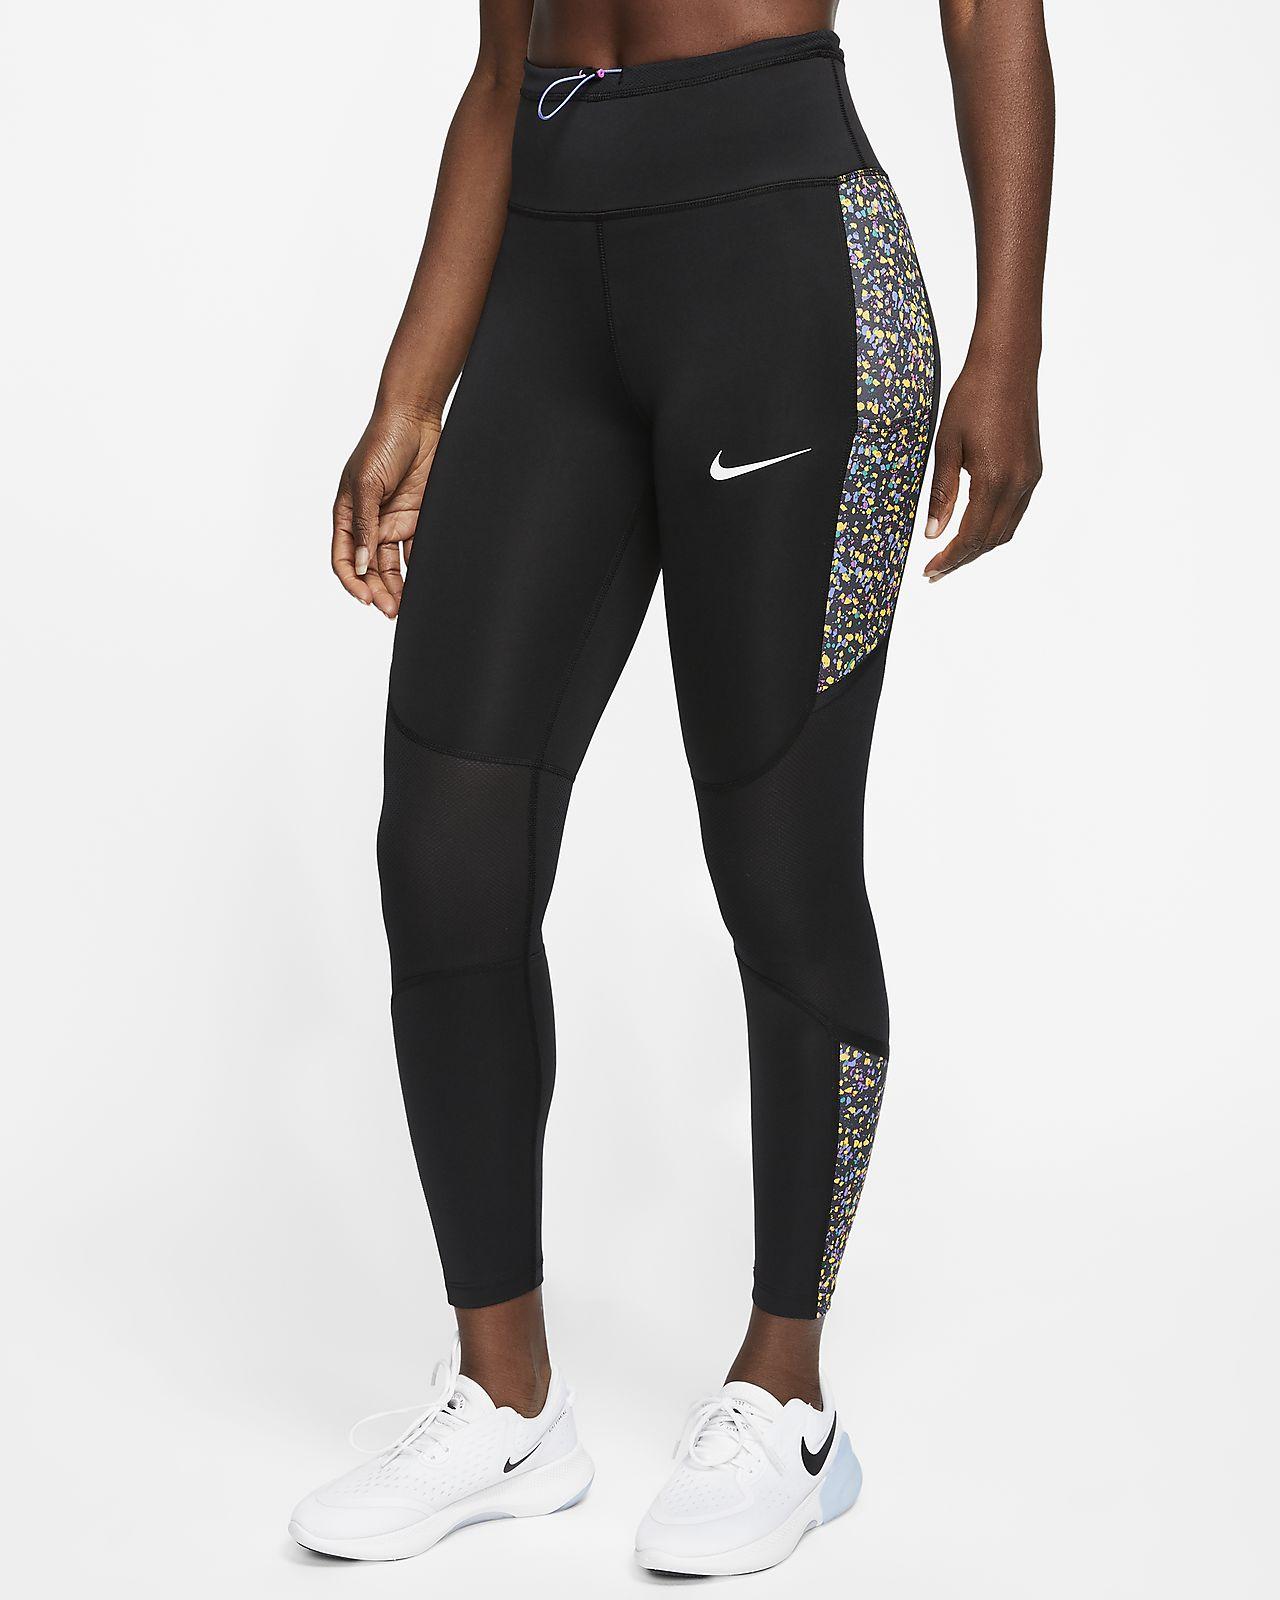 Nike Icon Clash Fast Women's Running Tights